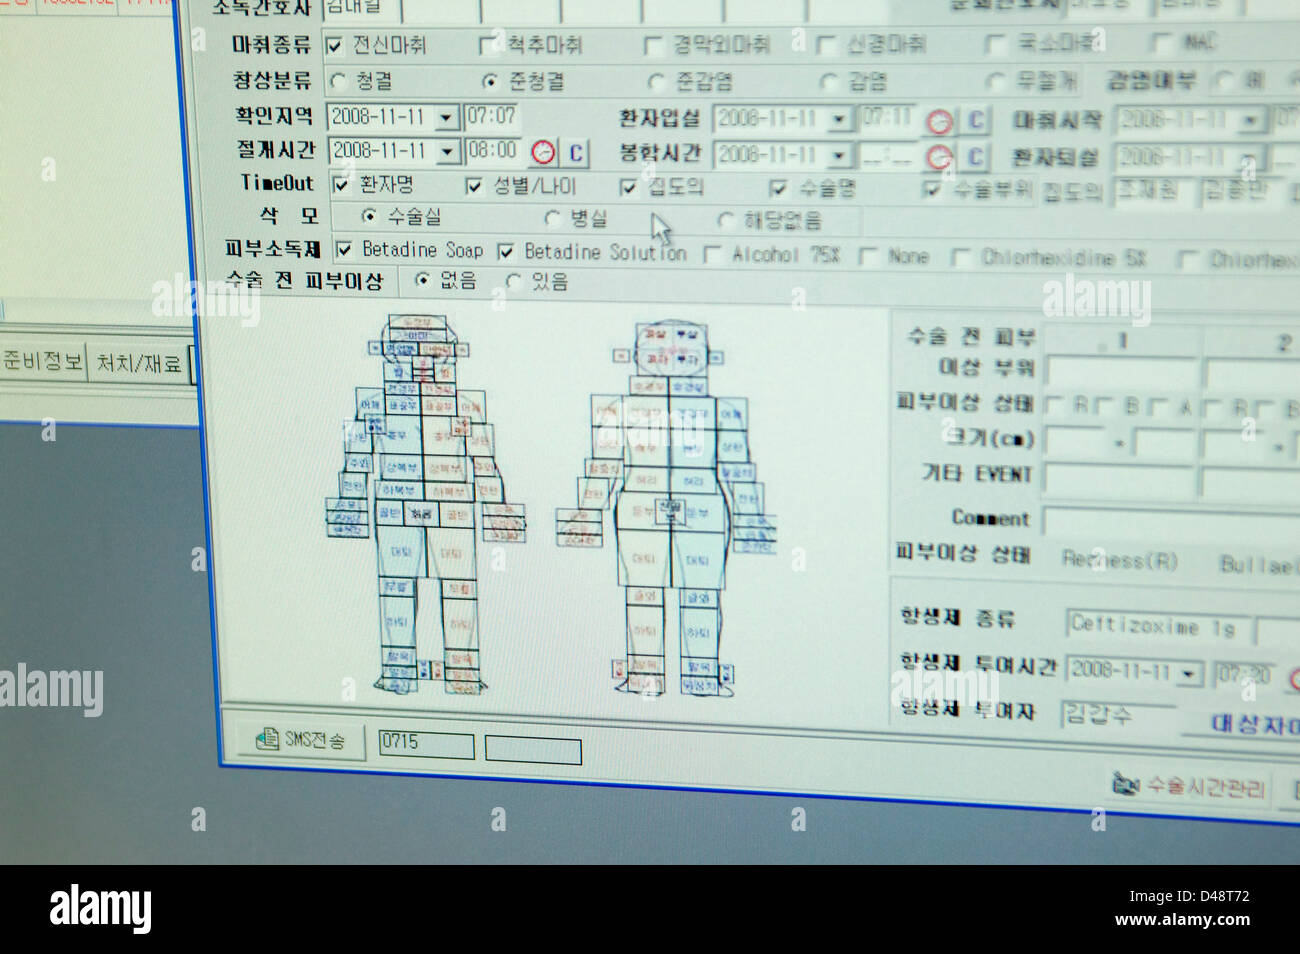 Cerca de el software de diagnóstico Imagen De Stock